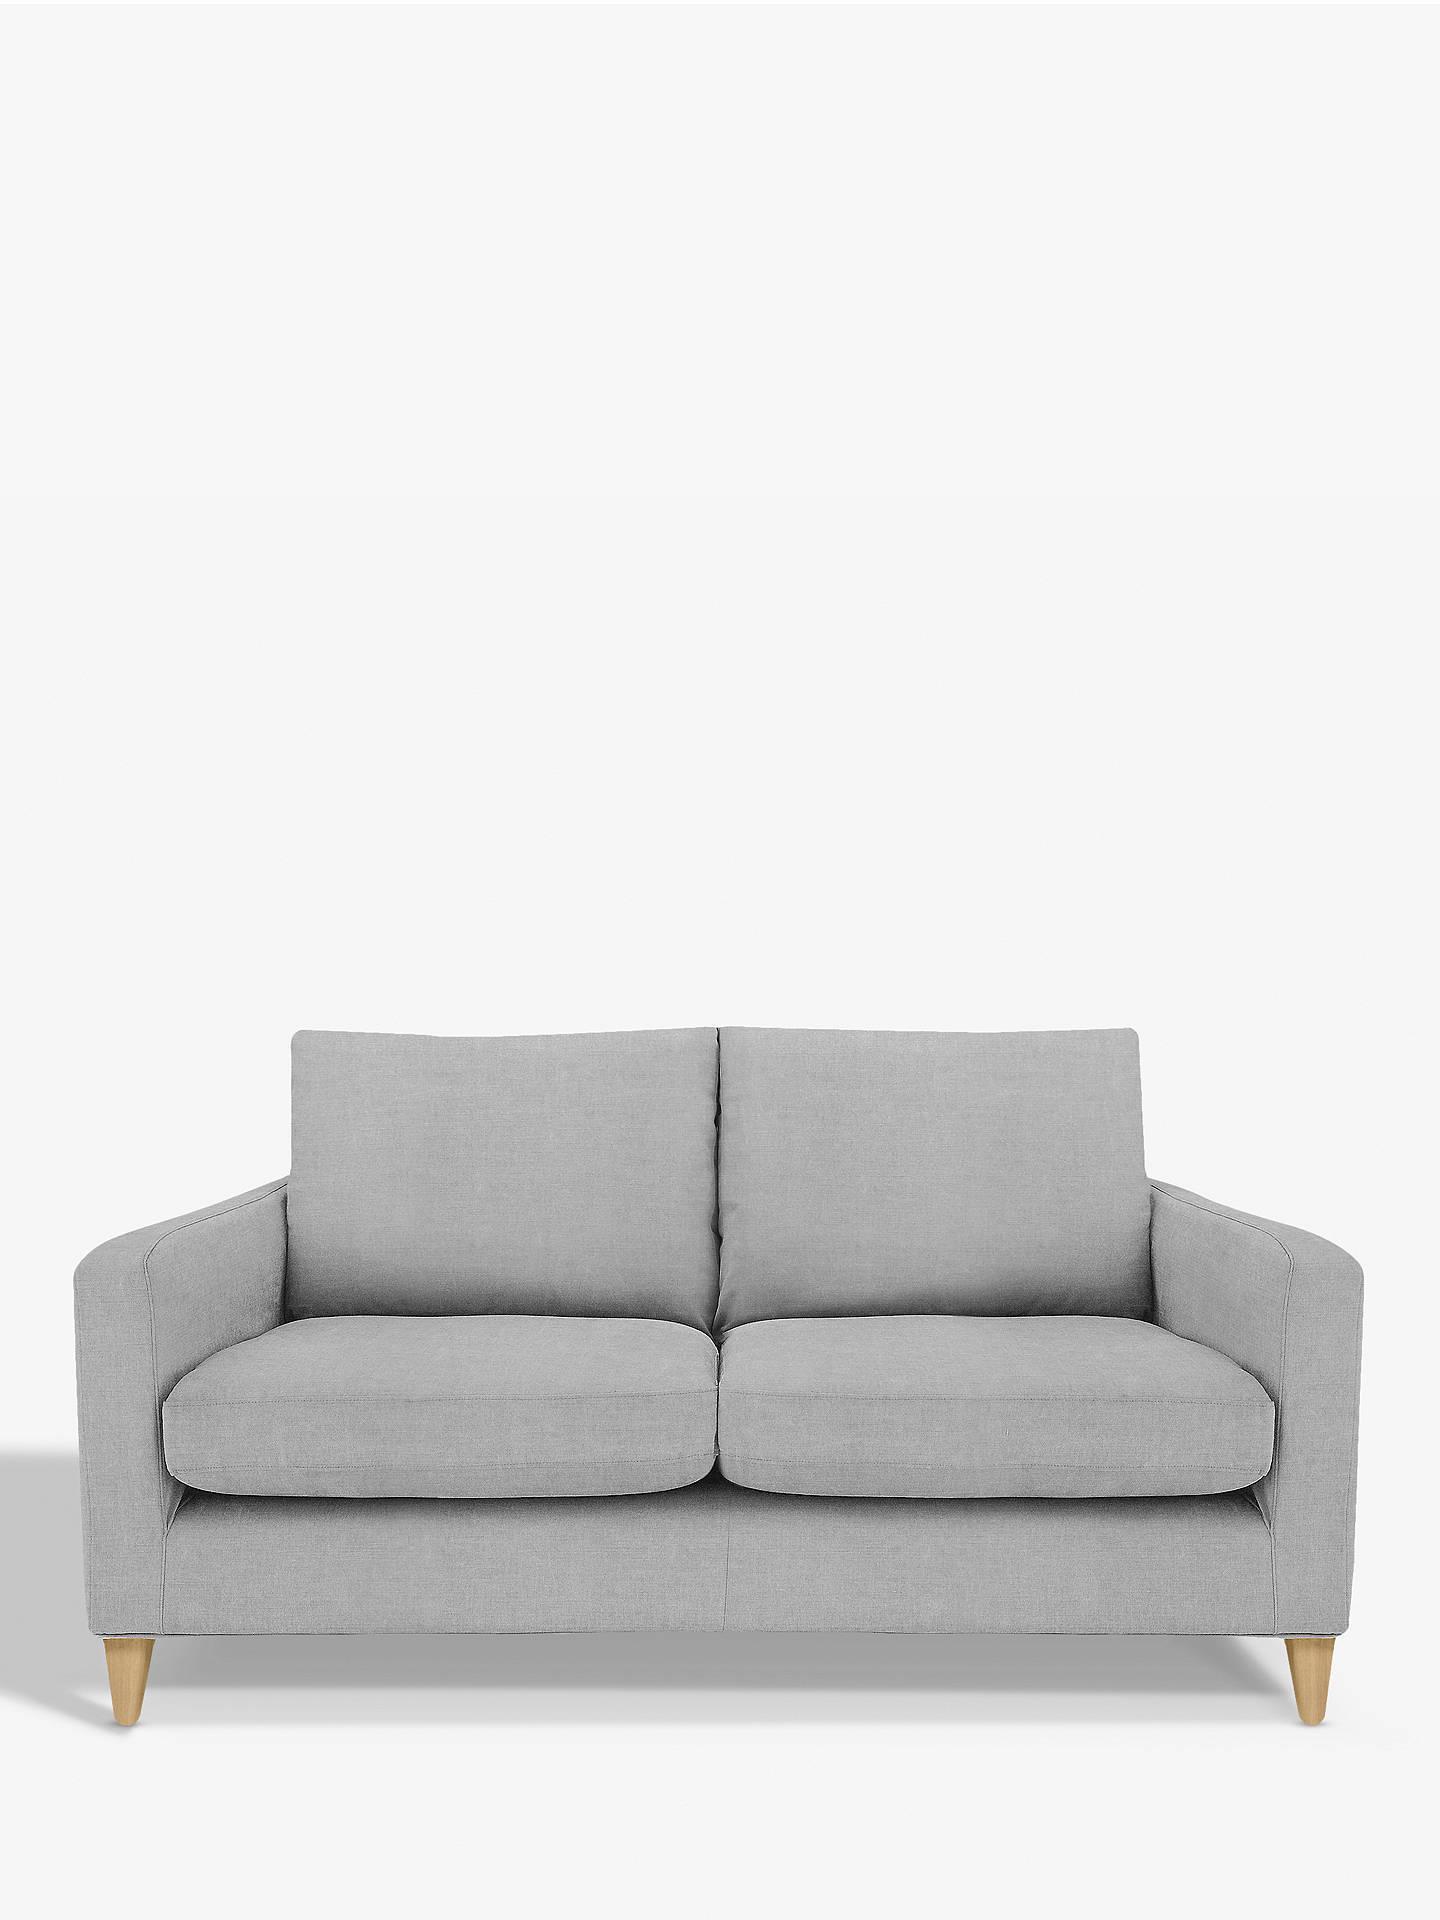 John Lewis Partners Bailey Medium 2 Seater Sofa